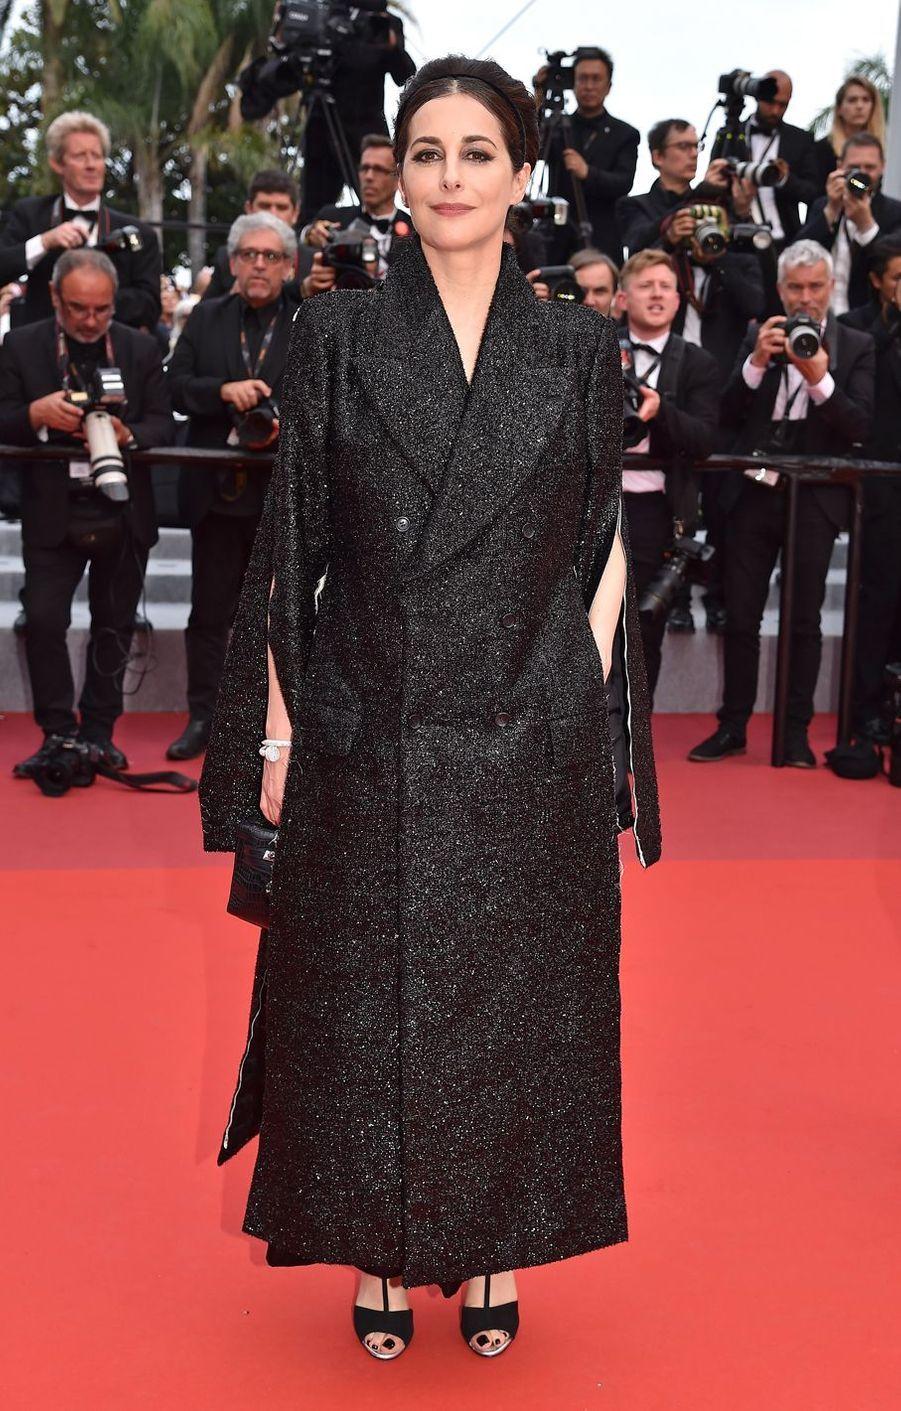 Amira Casar à Cannes, le 24 mai 2019